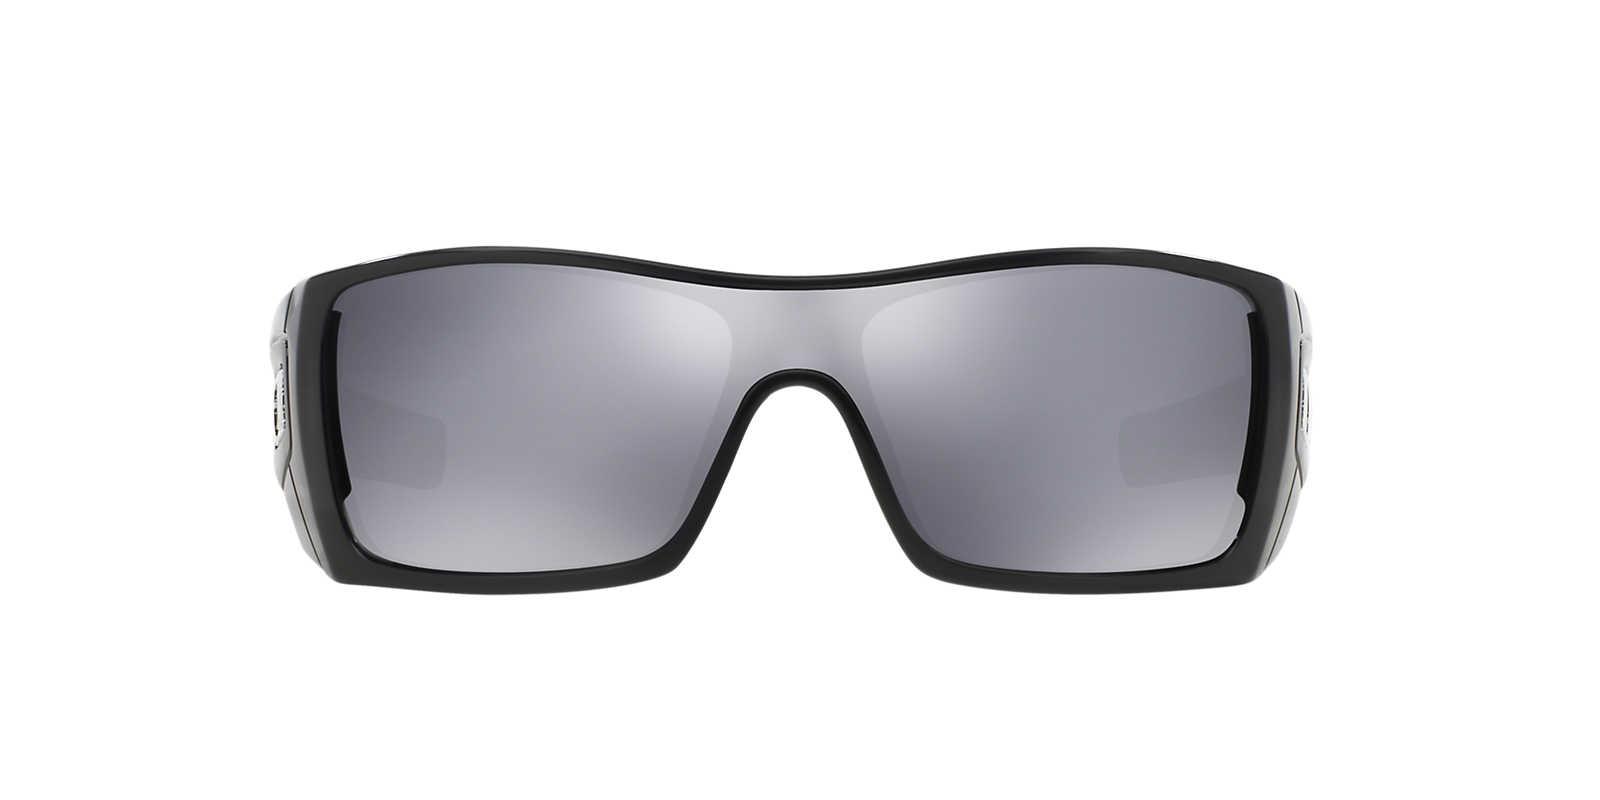 cheap mens oakley sunglasses stl7  OAKLEY Black OO9101 BATWOLF Black lenses 27mm